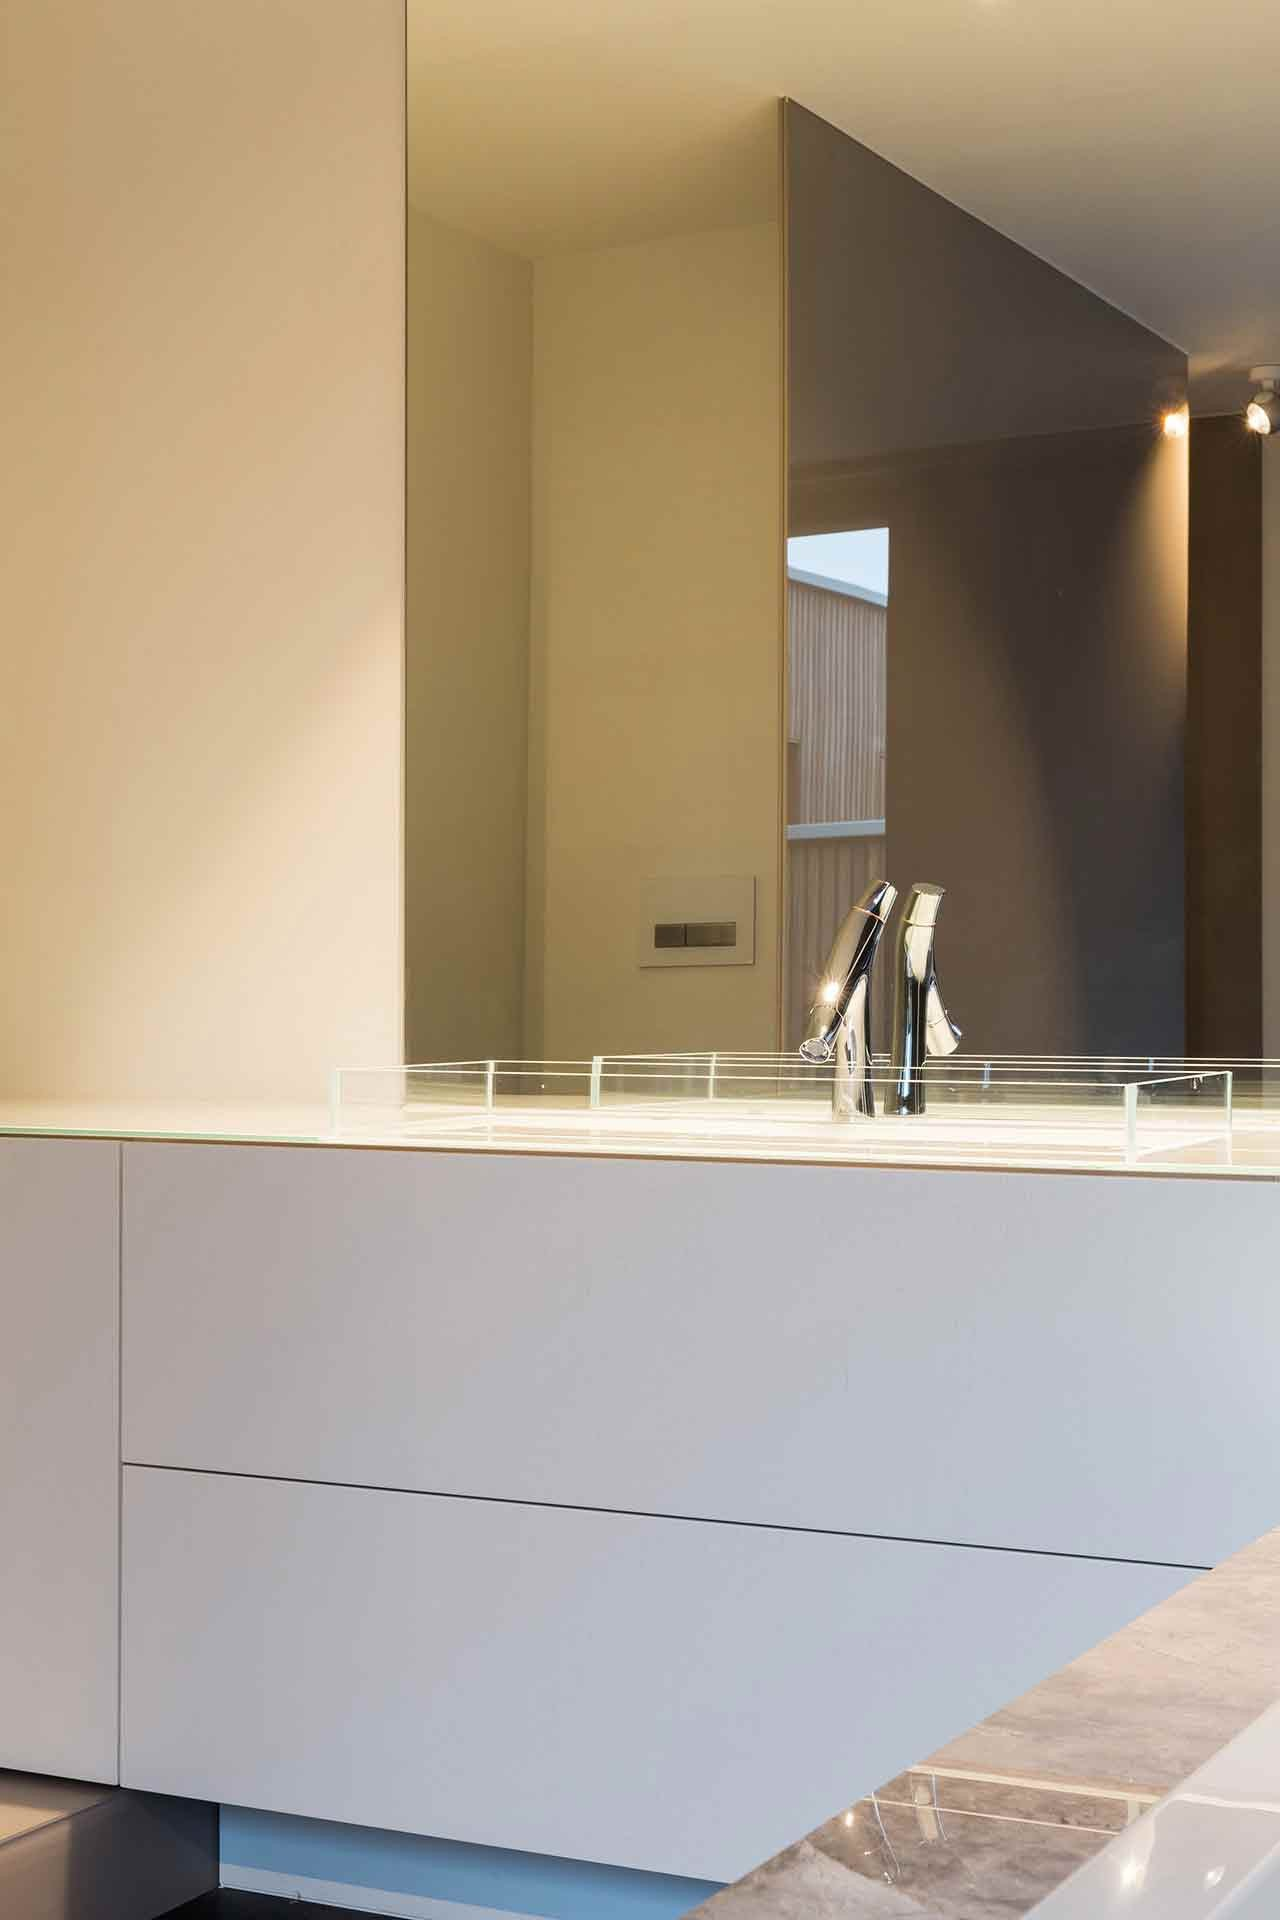 Totaalinrichting-badkamer-modern-SintMartenLatem-4.jpg